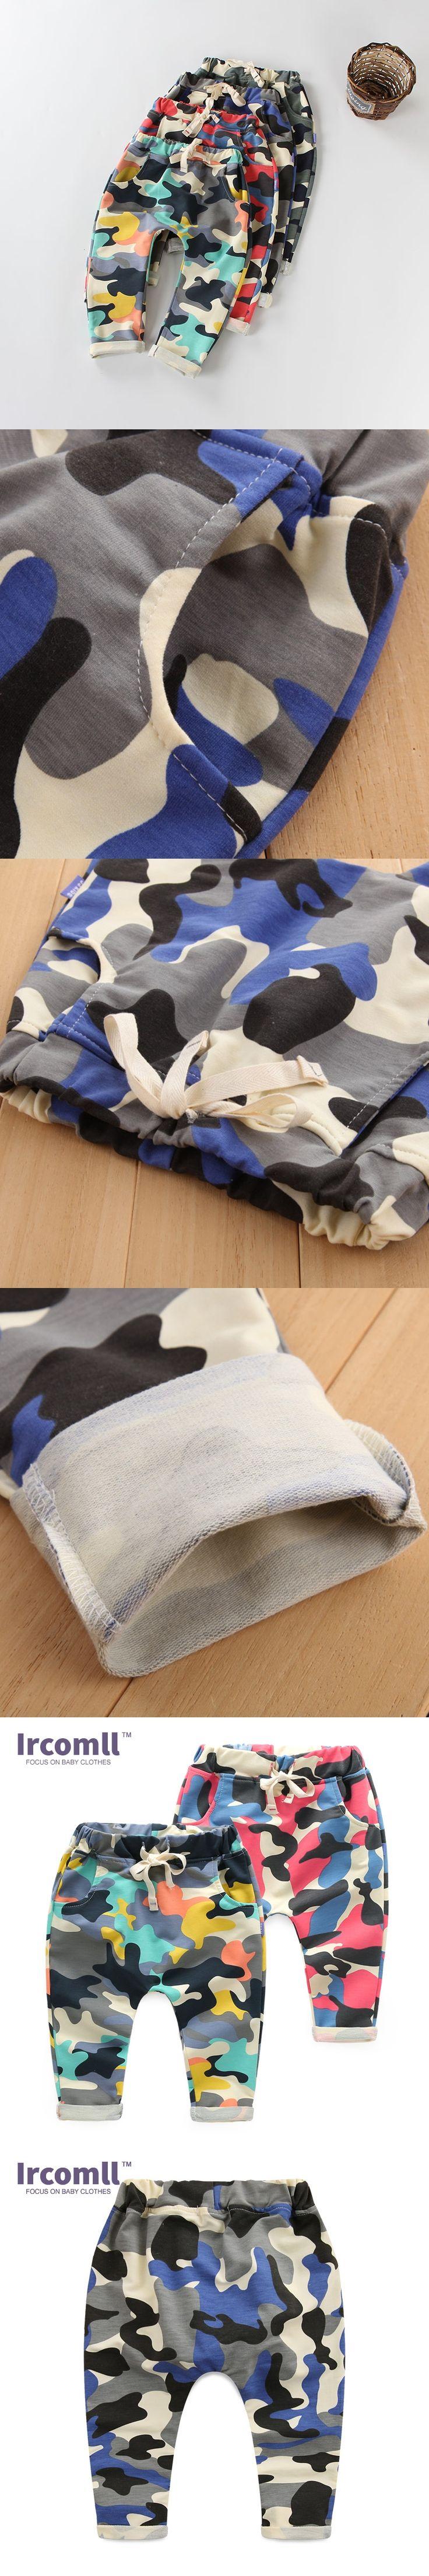 2017 New Children Haren Cotton Camouflage Pants Fashion Outdoor Boys Sport Pants Trousers Patchwork Jogger Pants Kid Clothes